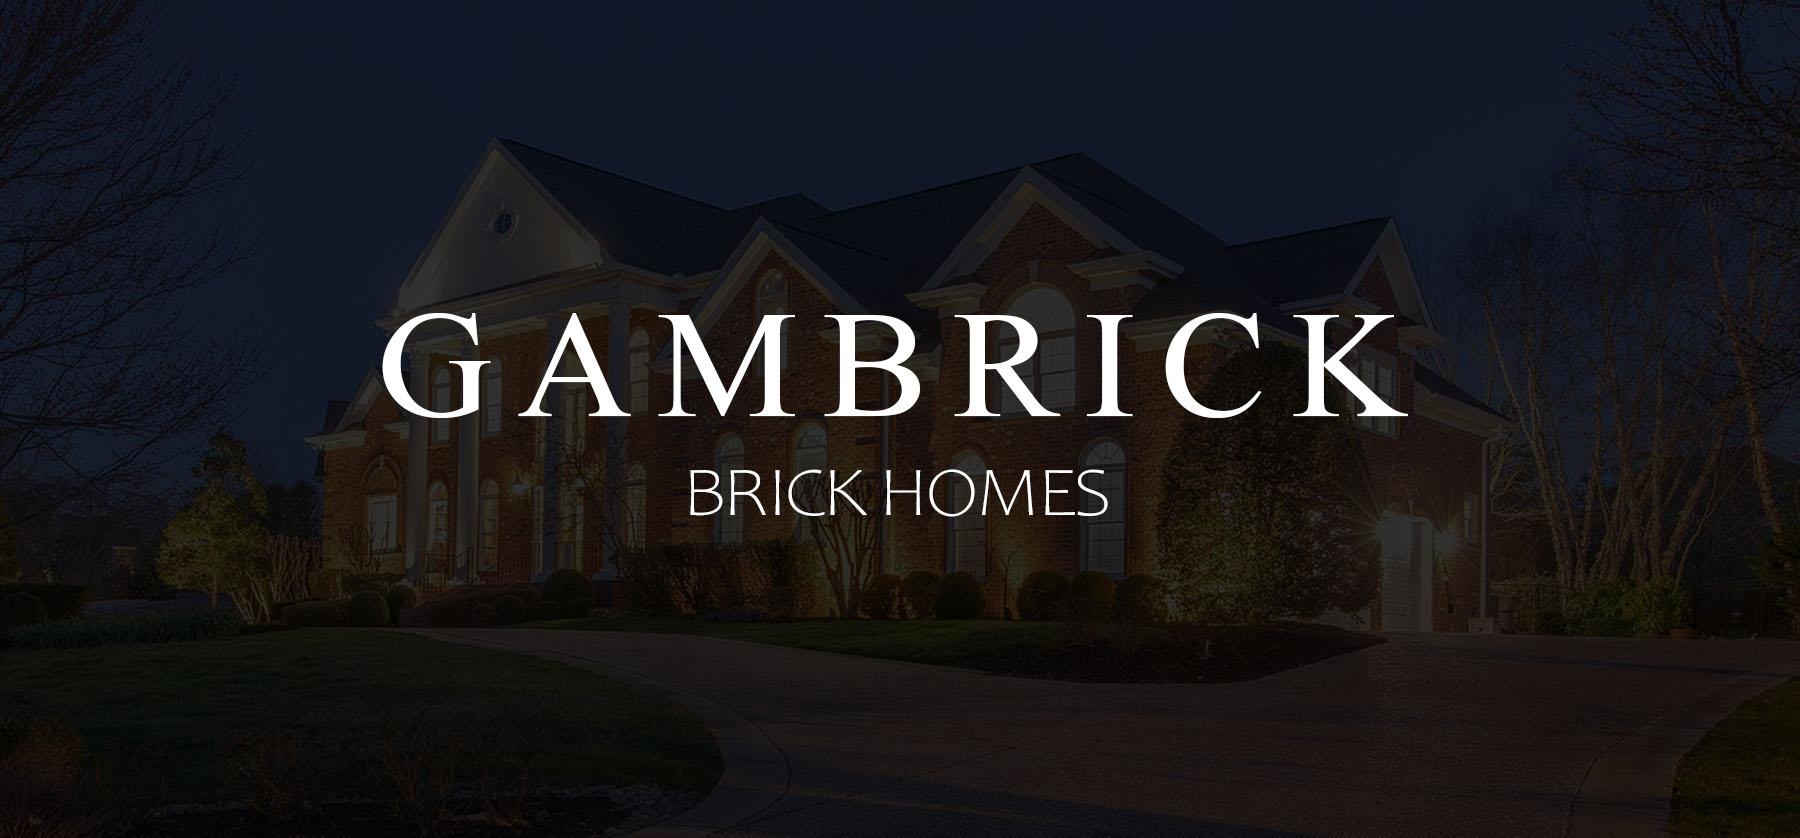 brick homes banner pic